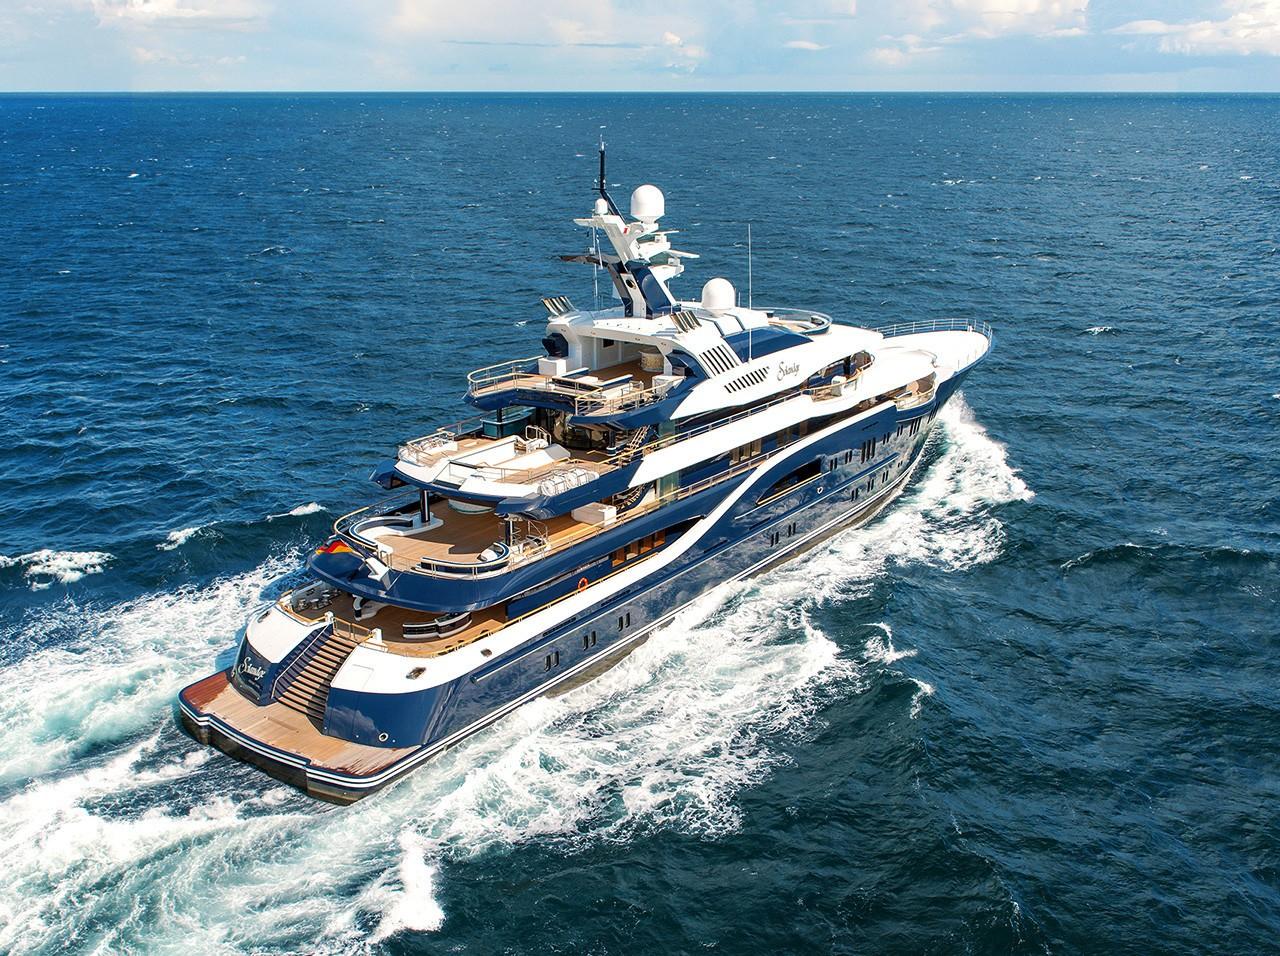 Spectacular motor yacht SOLANDGE by Lurssen